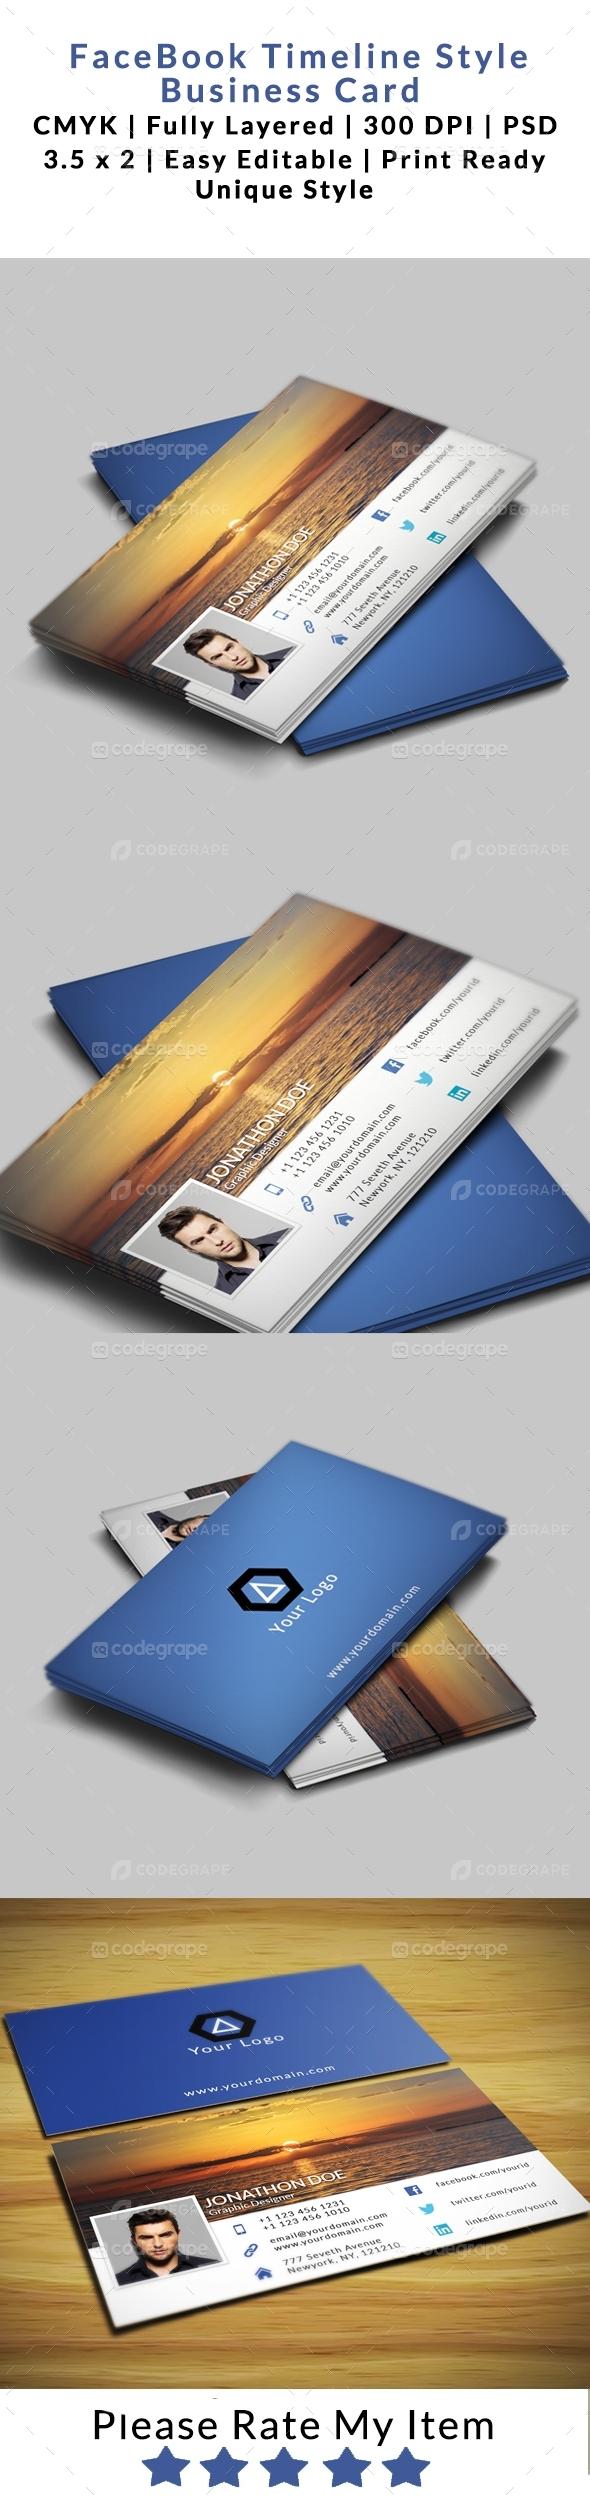 FaceBook Timeline Style Business card